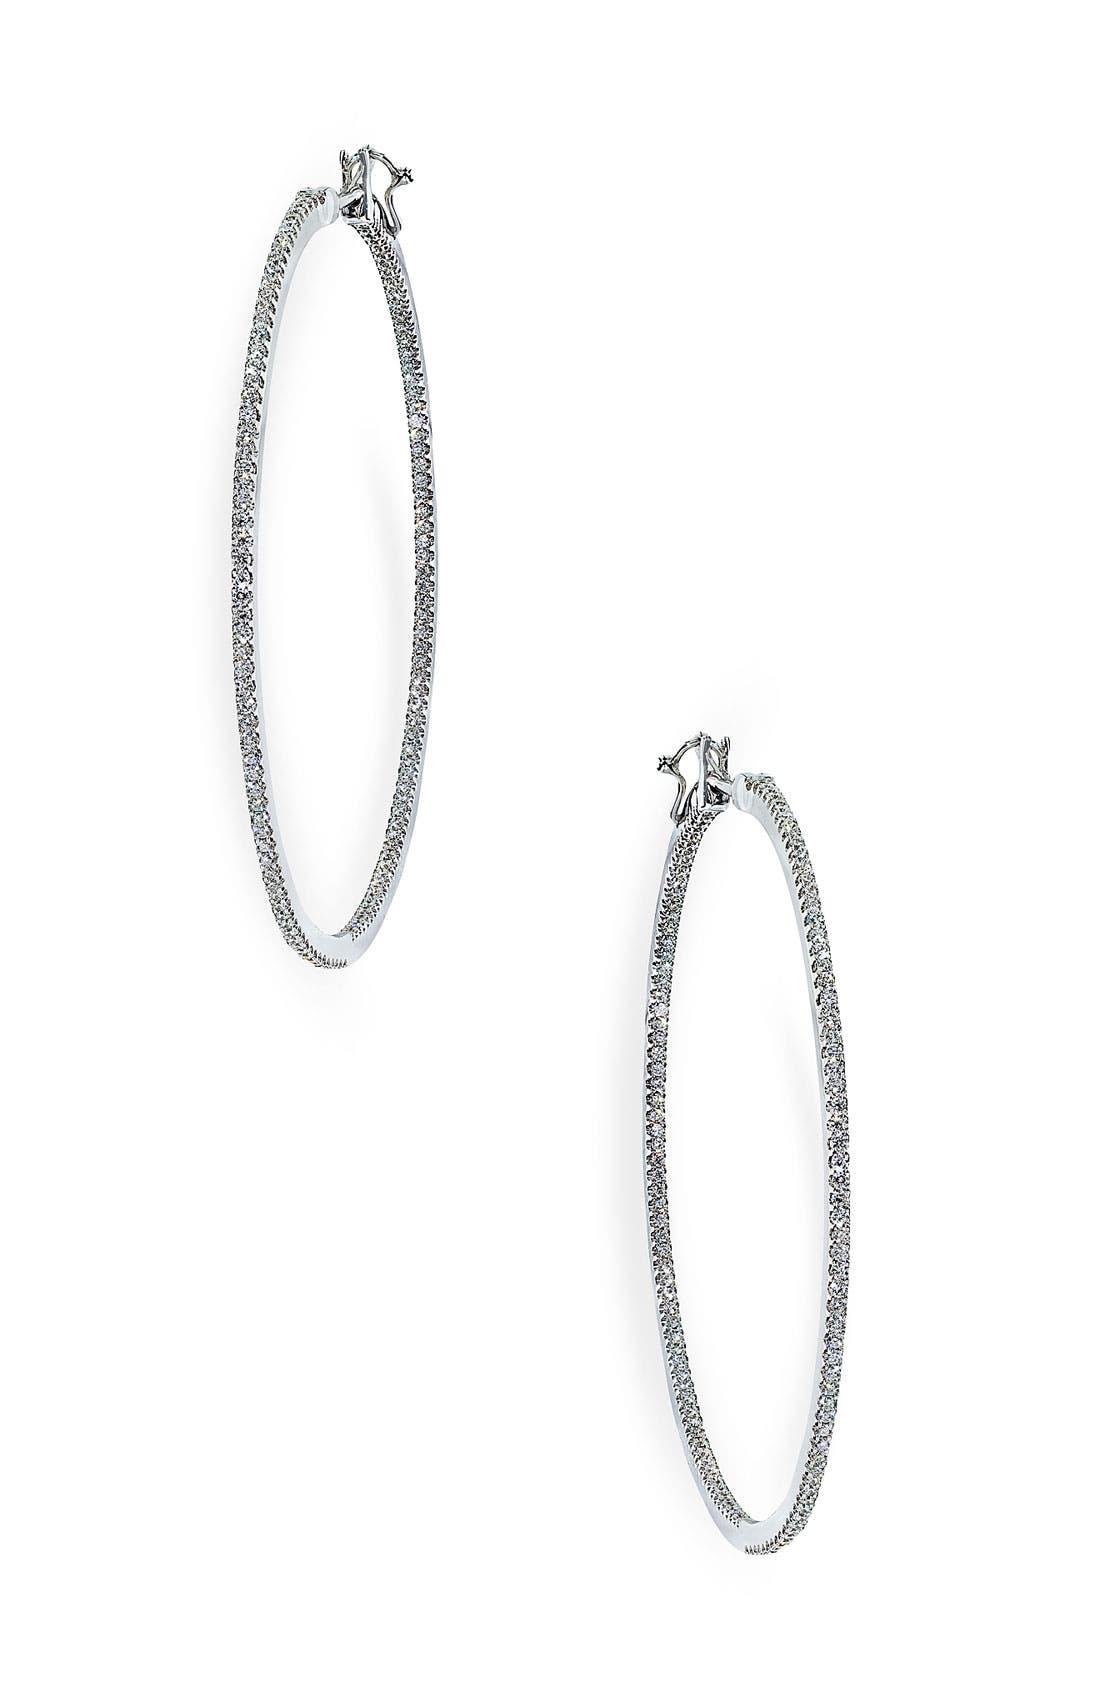 Main Image - Ivanka Trump 'Black & White' Medium Thin Diamond Hoop Earrings